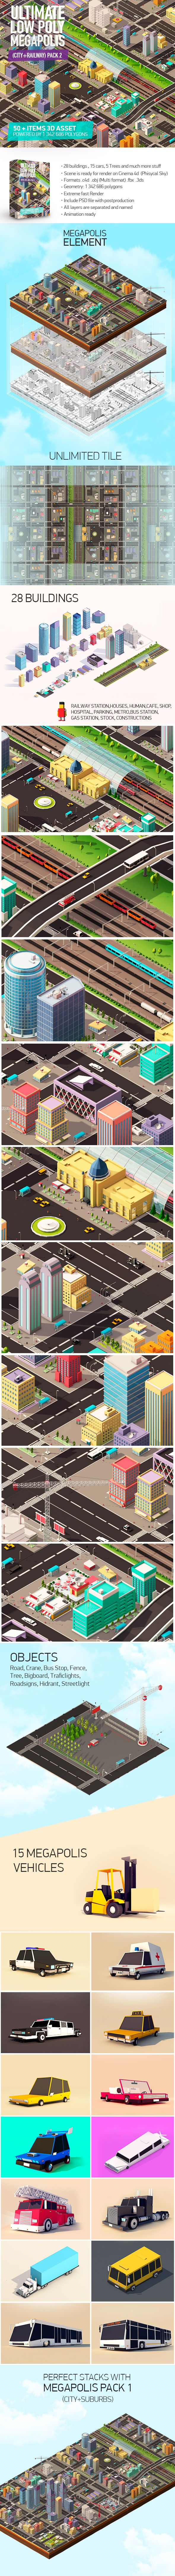 Ultimate Low Poly Megapolis Pack2 (City + Railway) 3D Models Design Template #cinema4d #3D #3dDesign Download here: https://3docean.net/item/ultimate-low-poly-megapolis-pack2-city-railway/18316186?ref=yinkira